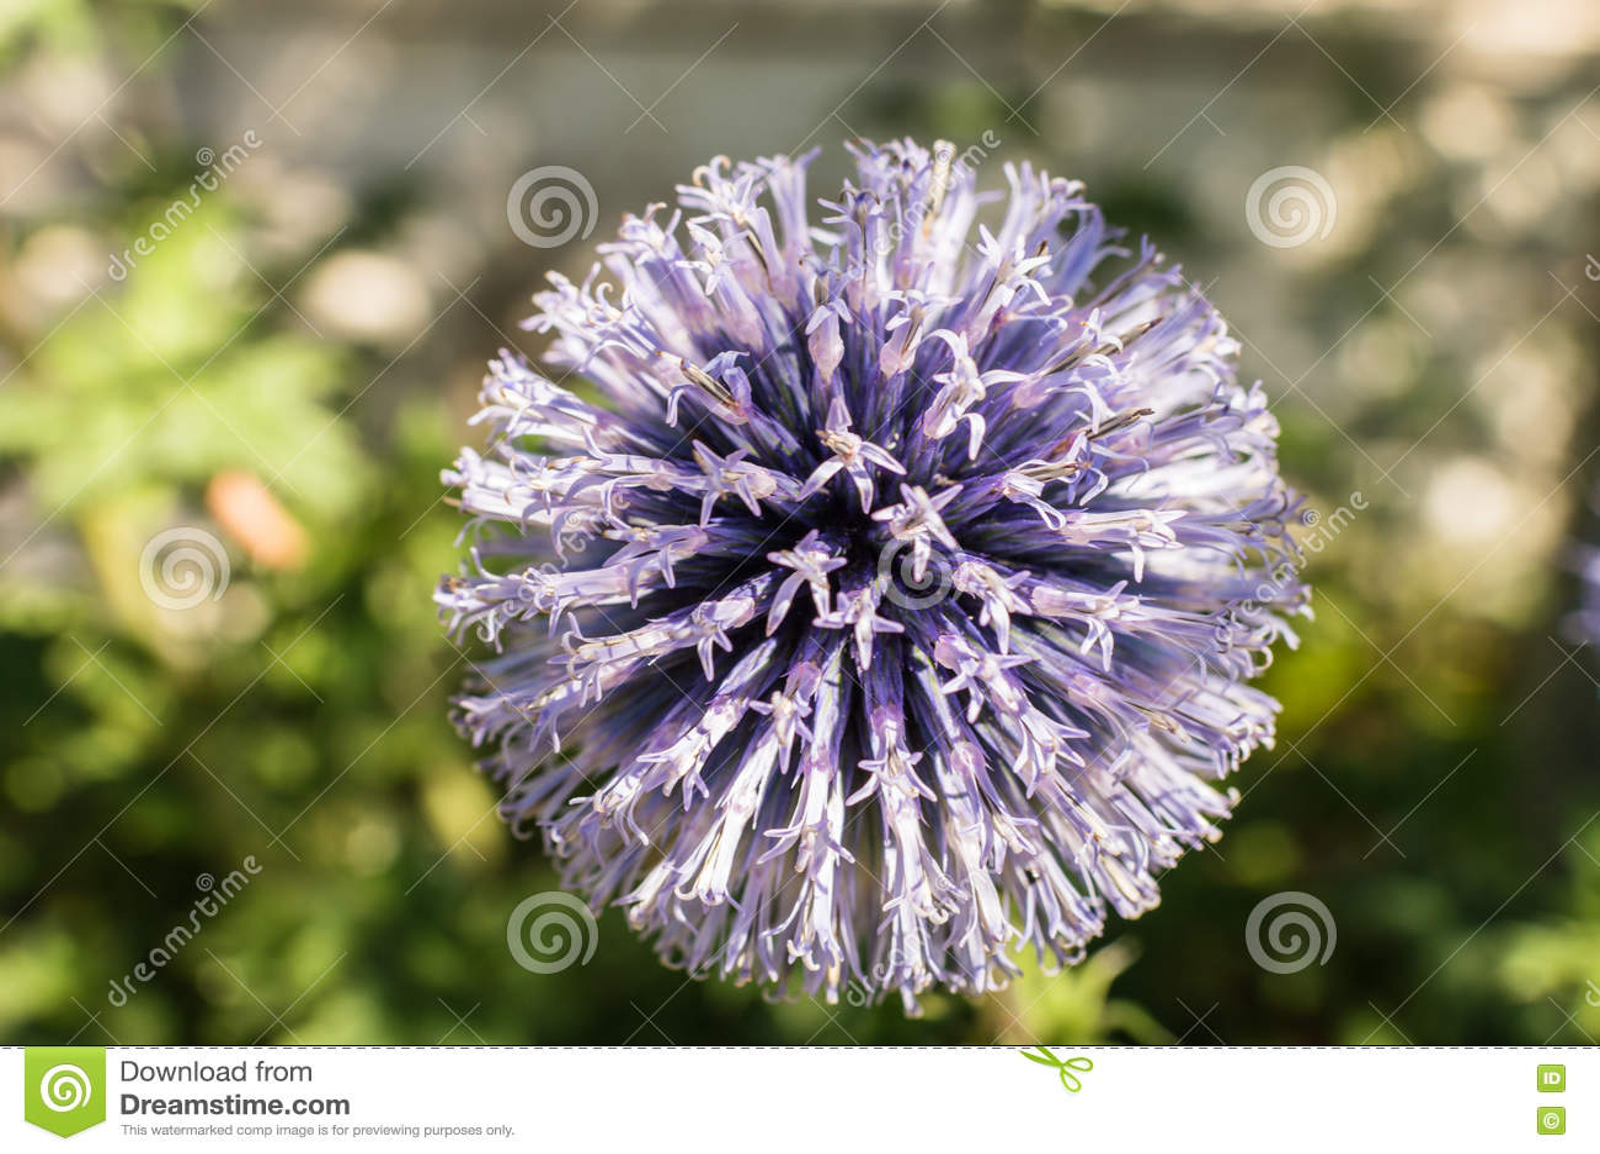 macro bleu de fleur dans le jardin image stock image du normal fleur 78582851. Black Bedroom Furniture Sets. Home Design Ideas